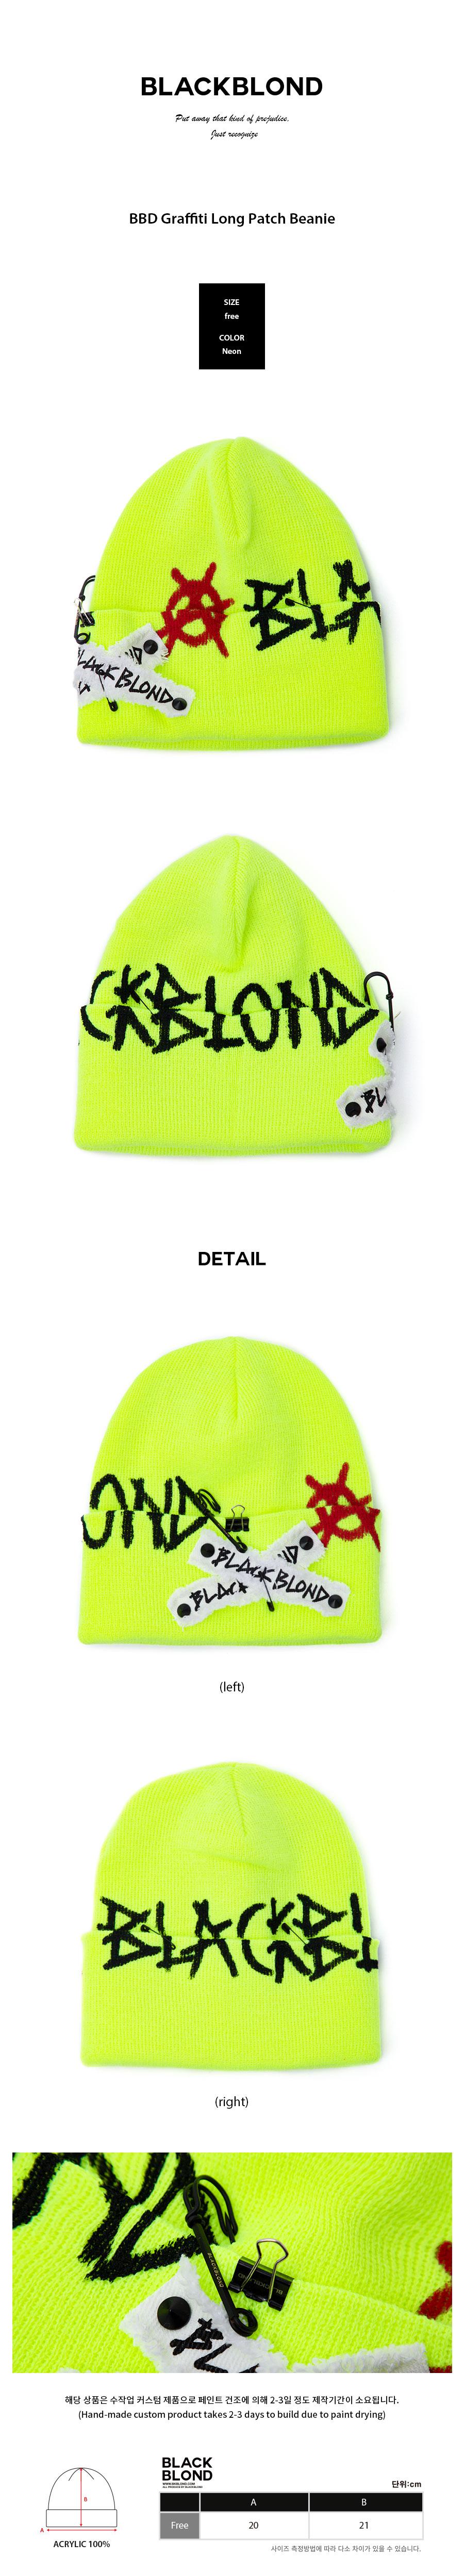 BLACKBLOND - BBD Graffiti Logo Patch Beanie (Neon)